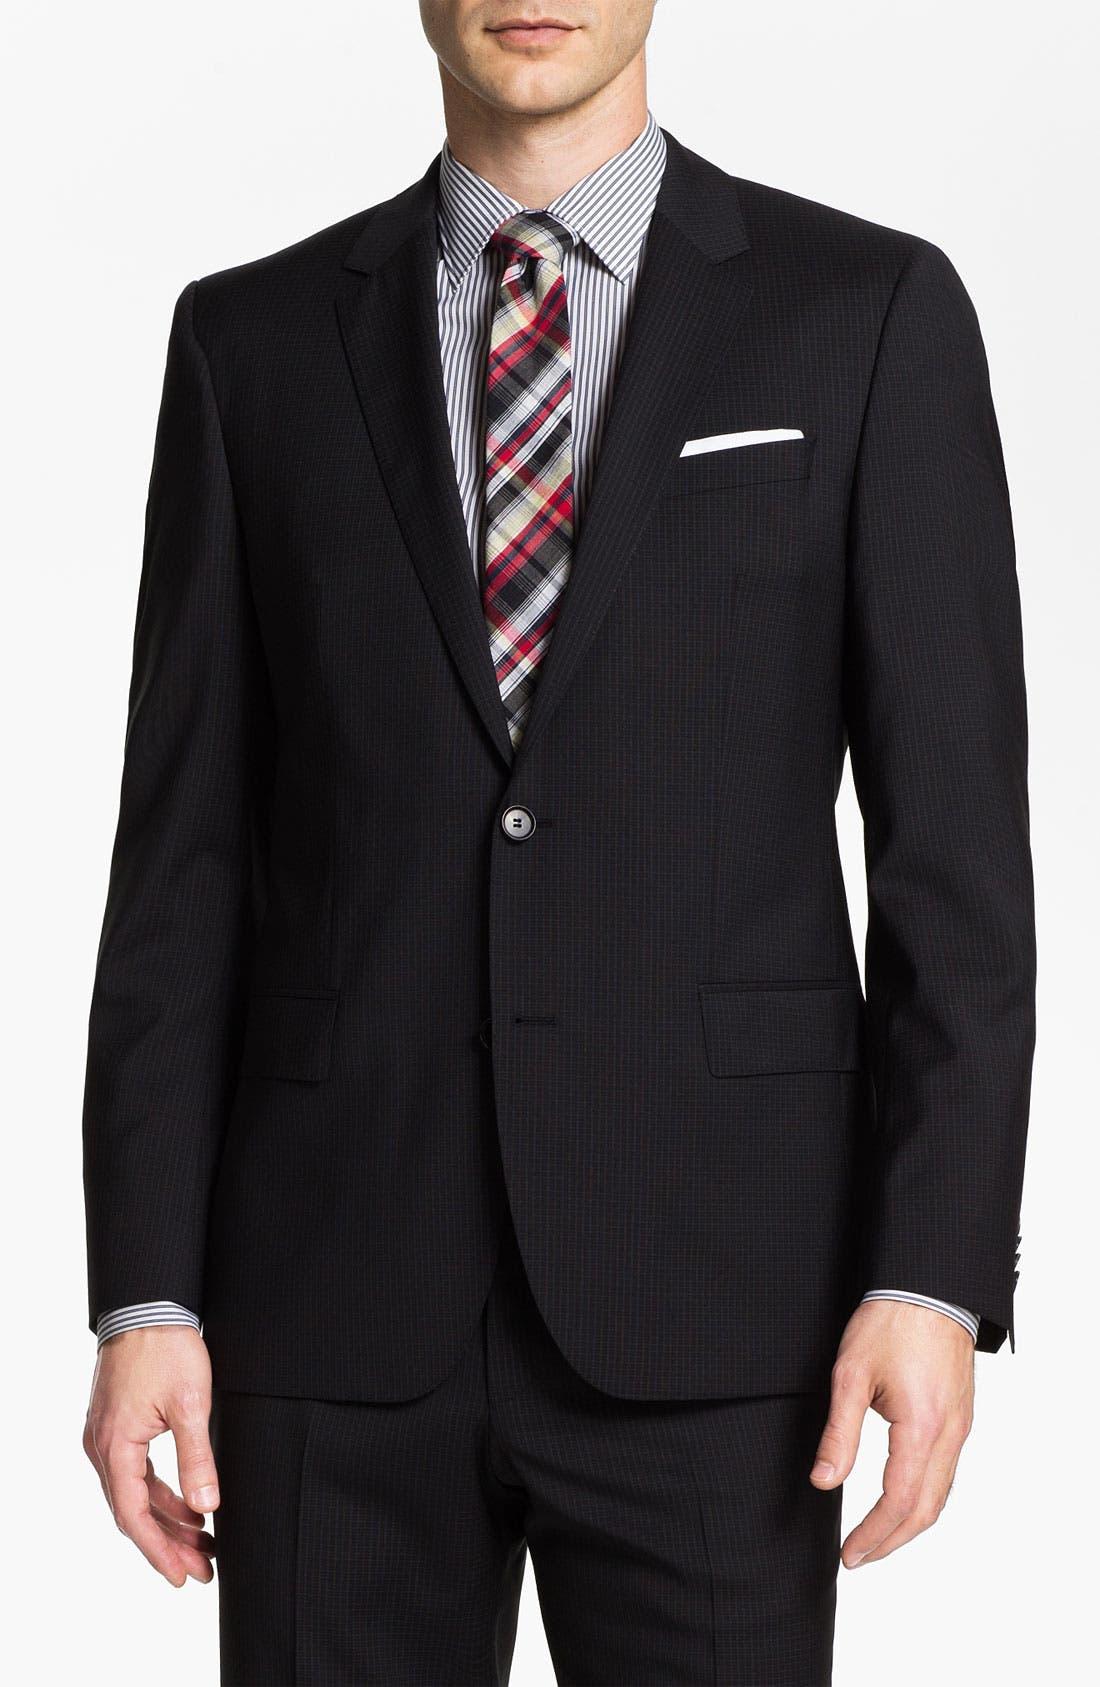 Main Image - BOSS Black 'Huge/Genius' Trim Fit Suit